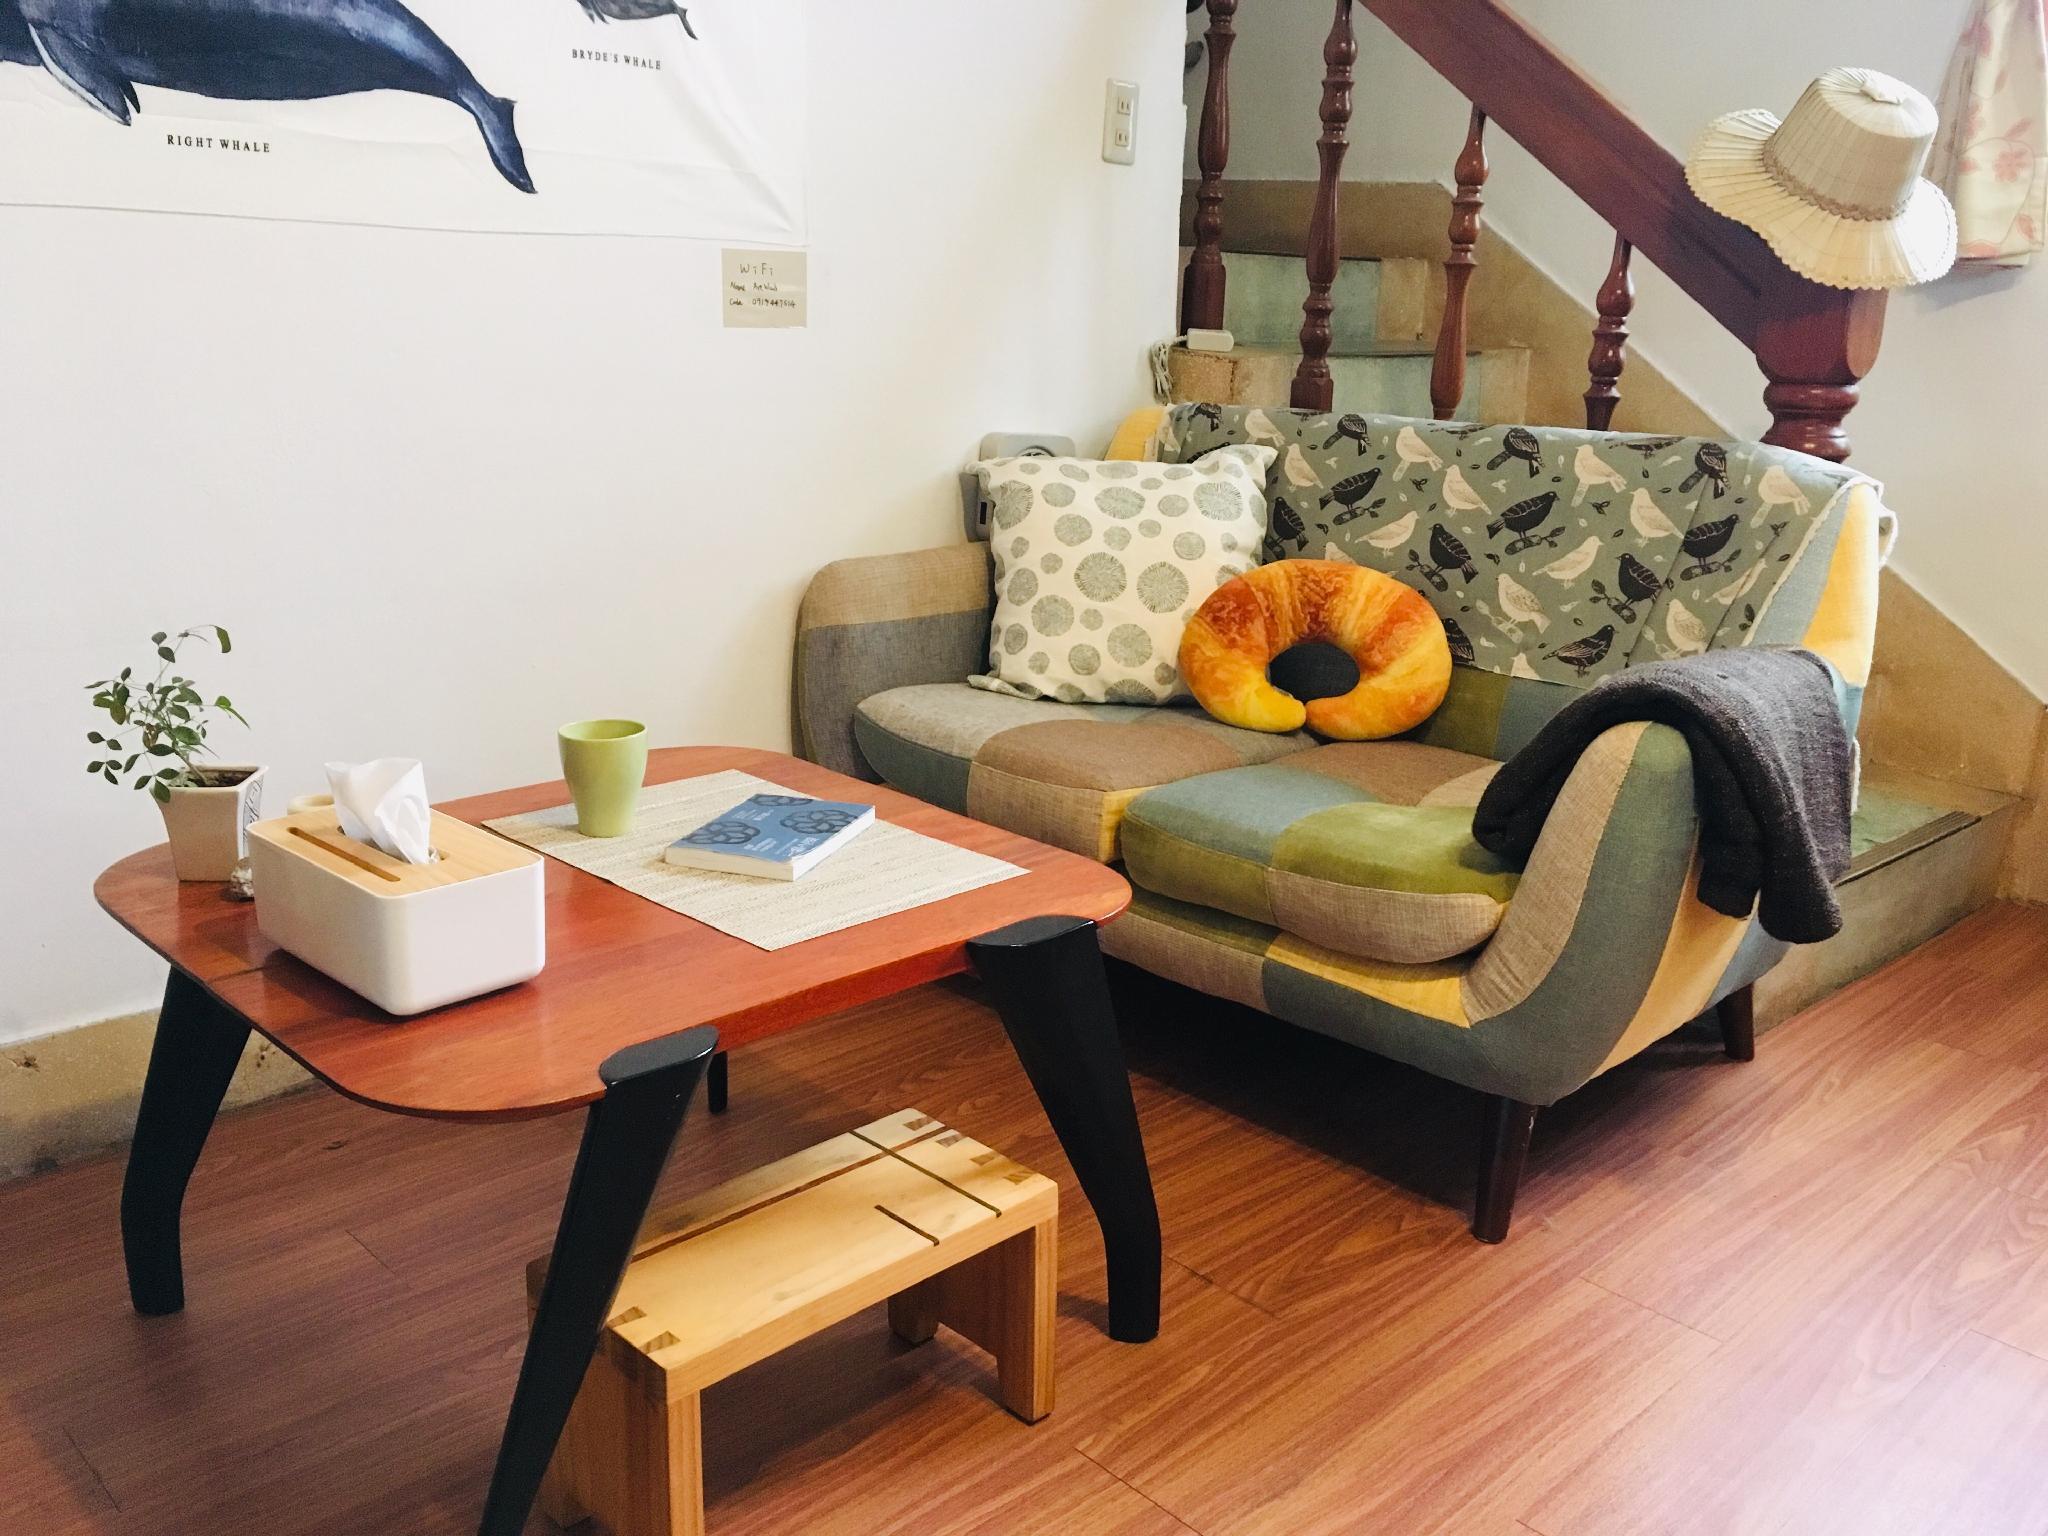 藝木宅chill in-House Of Wood n Art 旅程•單人房 寧靜社區